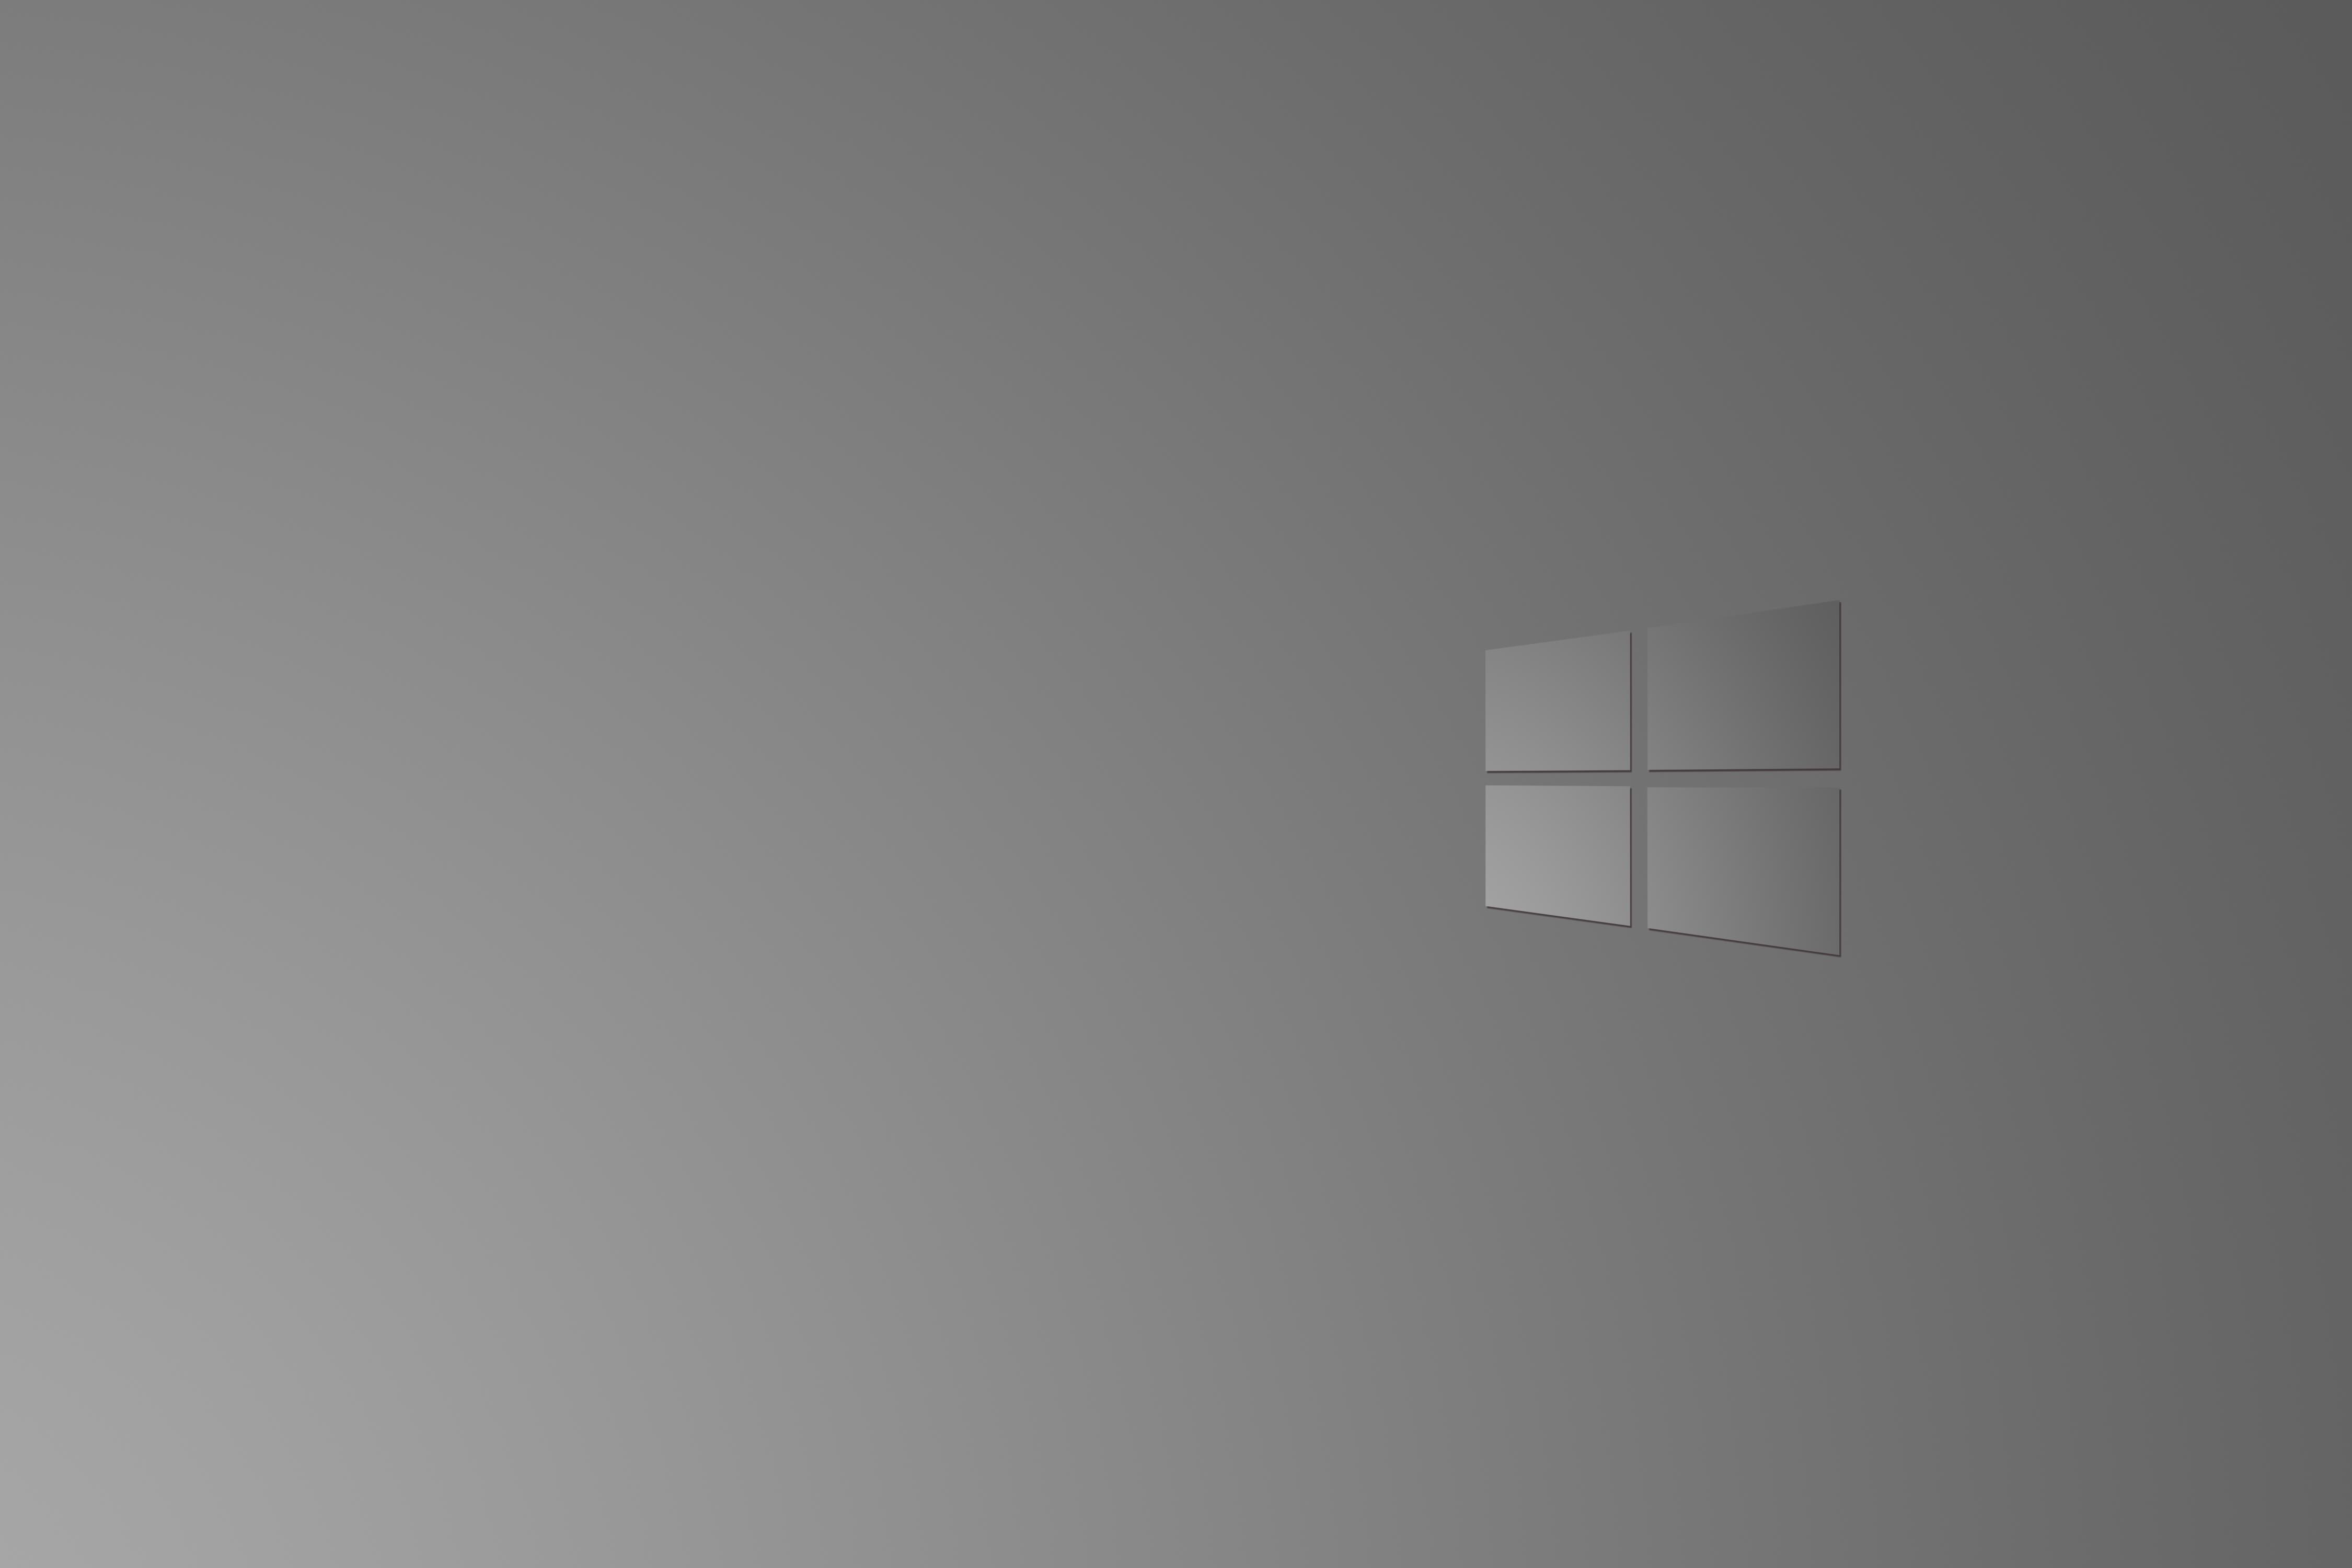 Galvanised Windows windows wallpaper